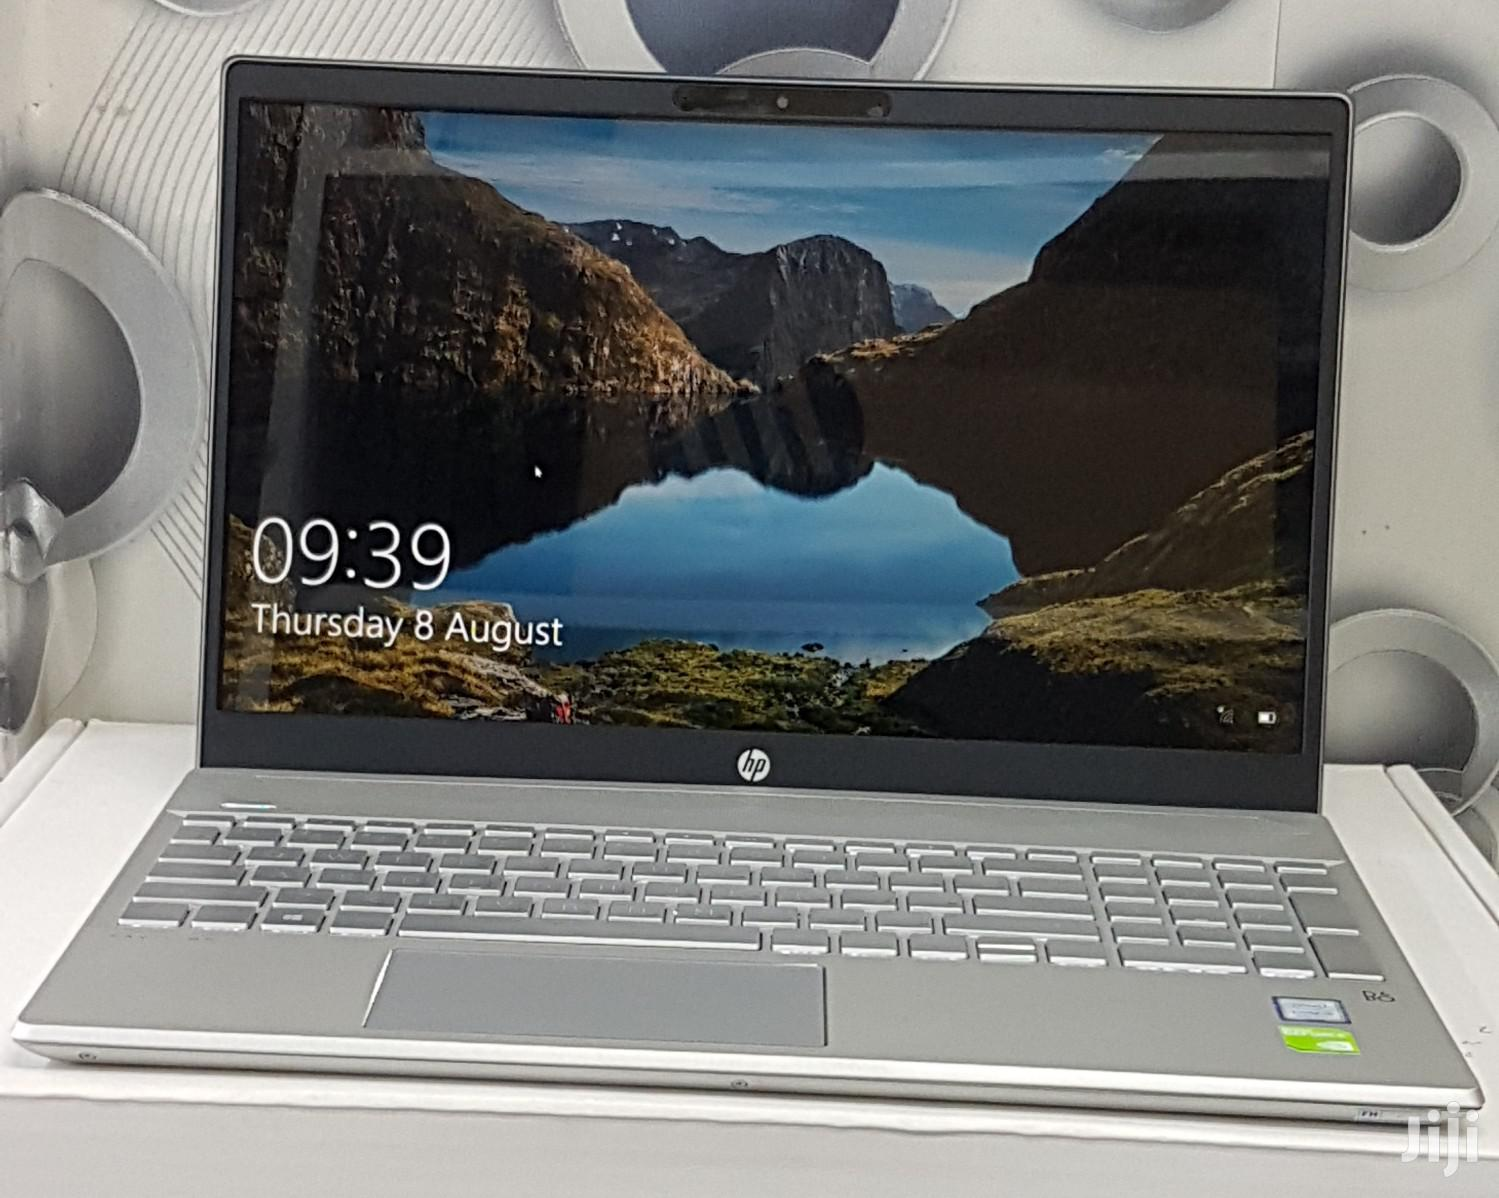 New Laptop HP Pavilion 15 8GB Intel Core i5 SSHD (Hybrid) 1T   Laptops & Computers for sale in Nairobi Central, Nairobi, Kenya